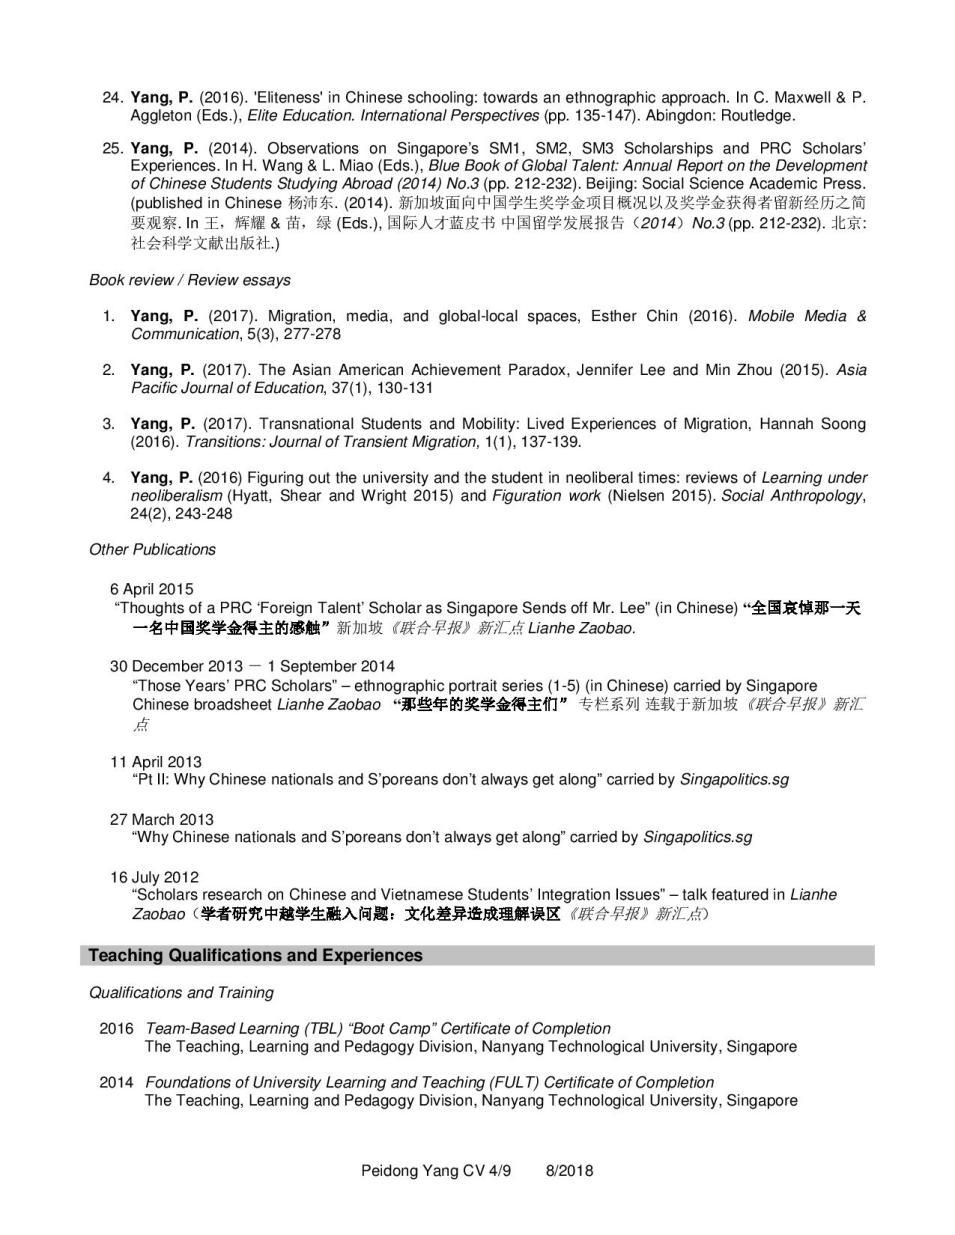 CV YANG Peidong_8.2018-page-004.jpg